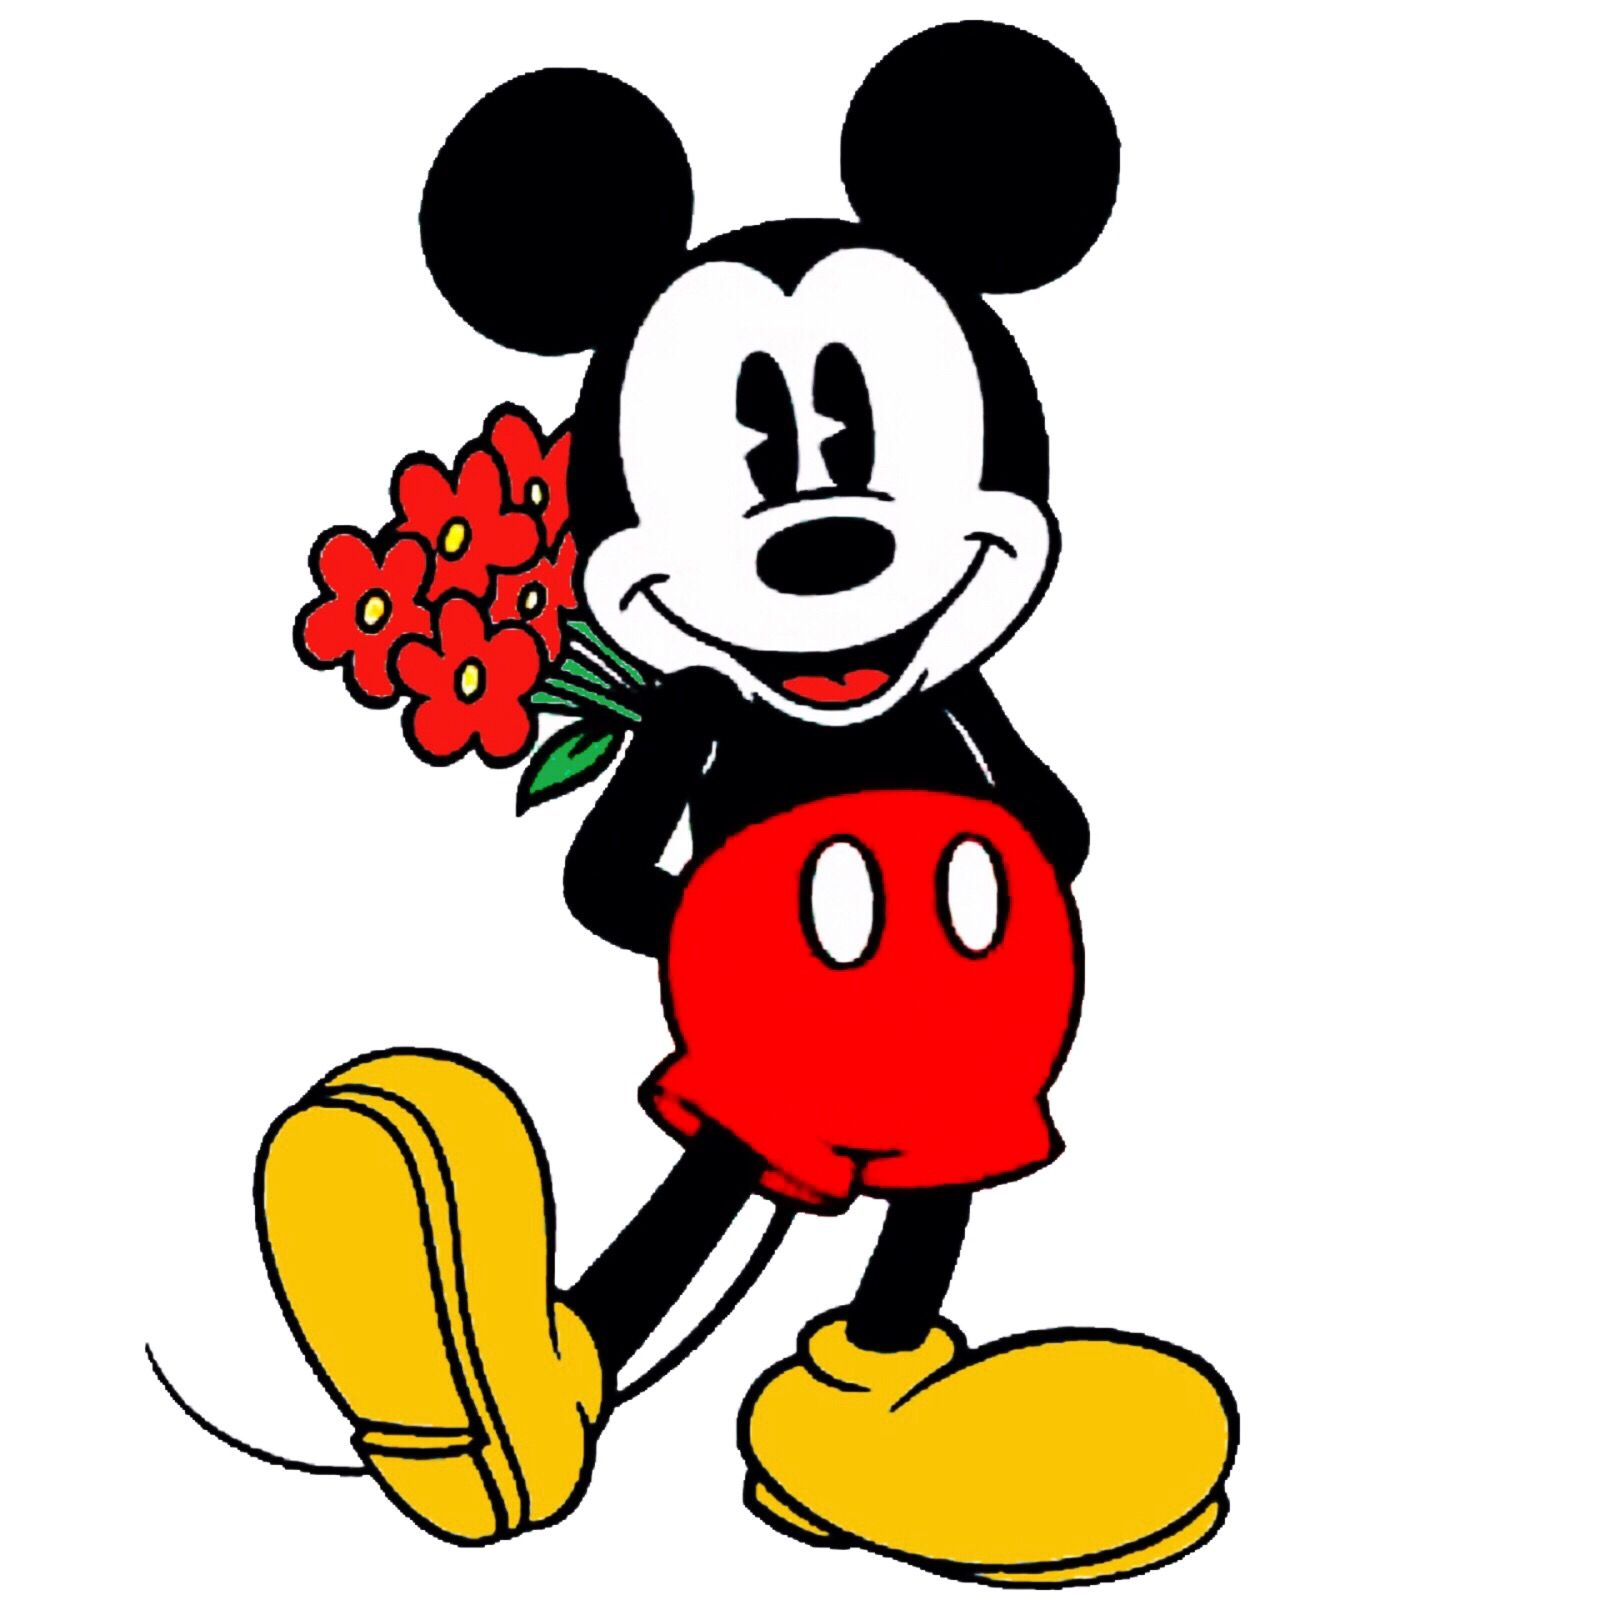 Pin By Glenda Arias On Mickey Mickey Mouse Pictures Mickey Mouse Drawings Mickey Mouse Wallpaper